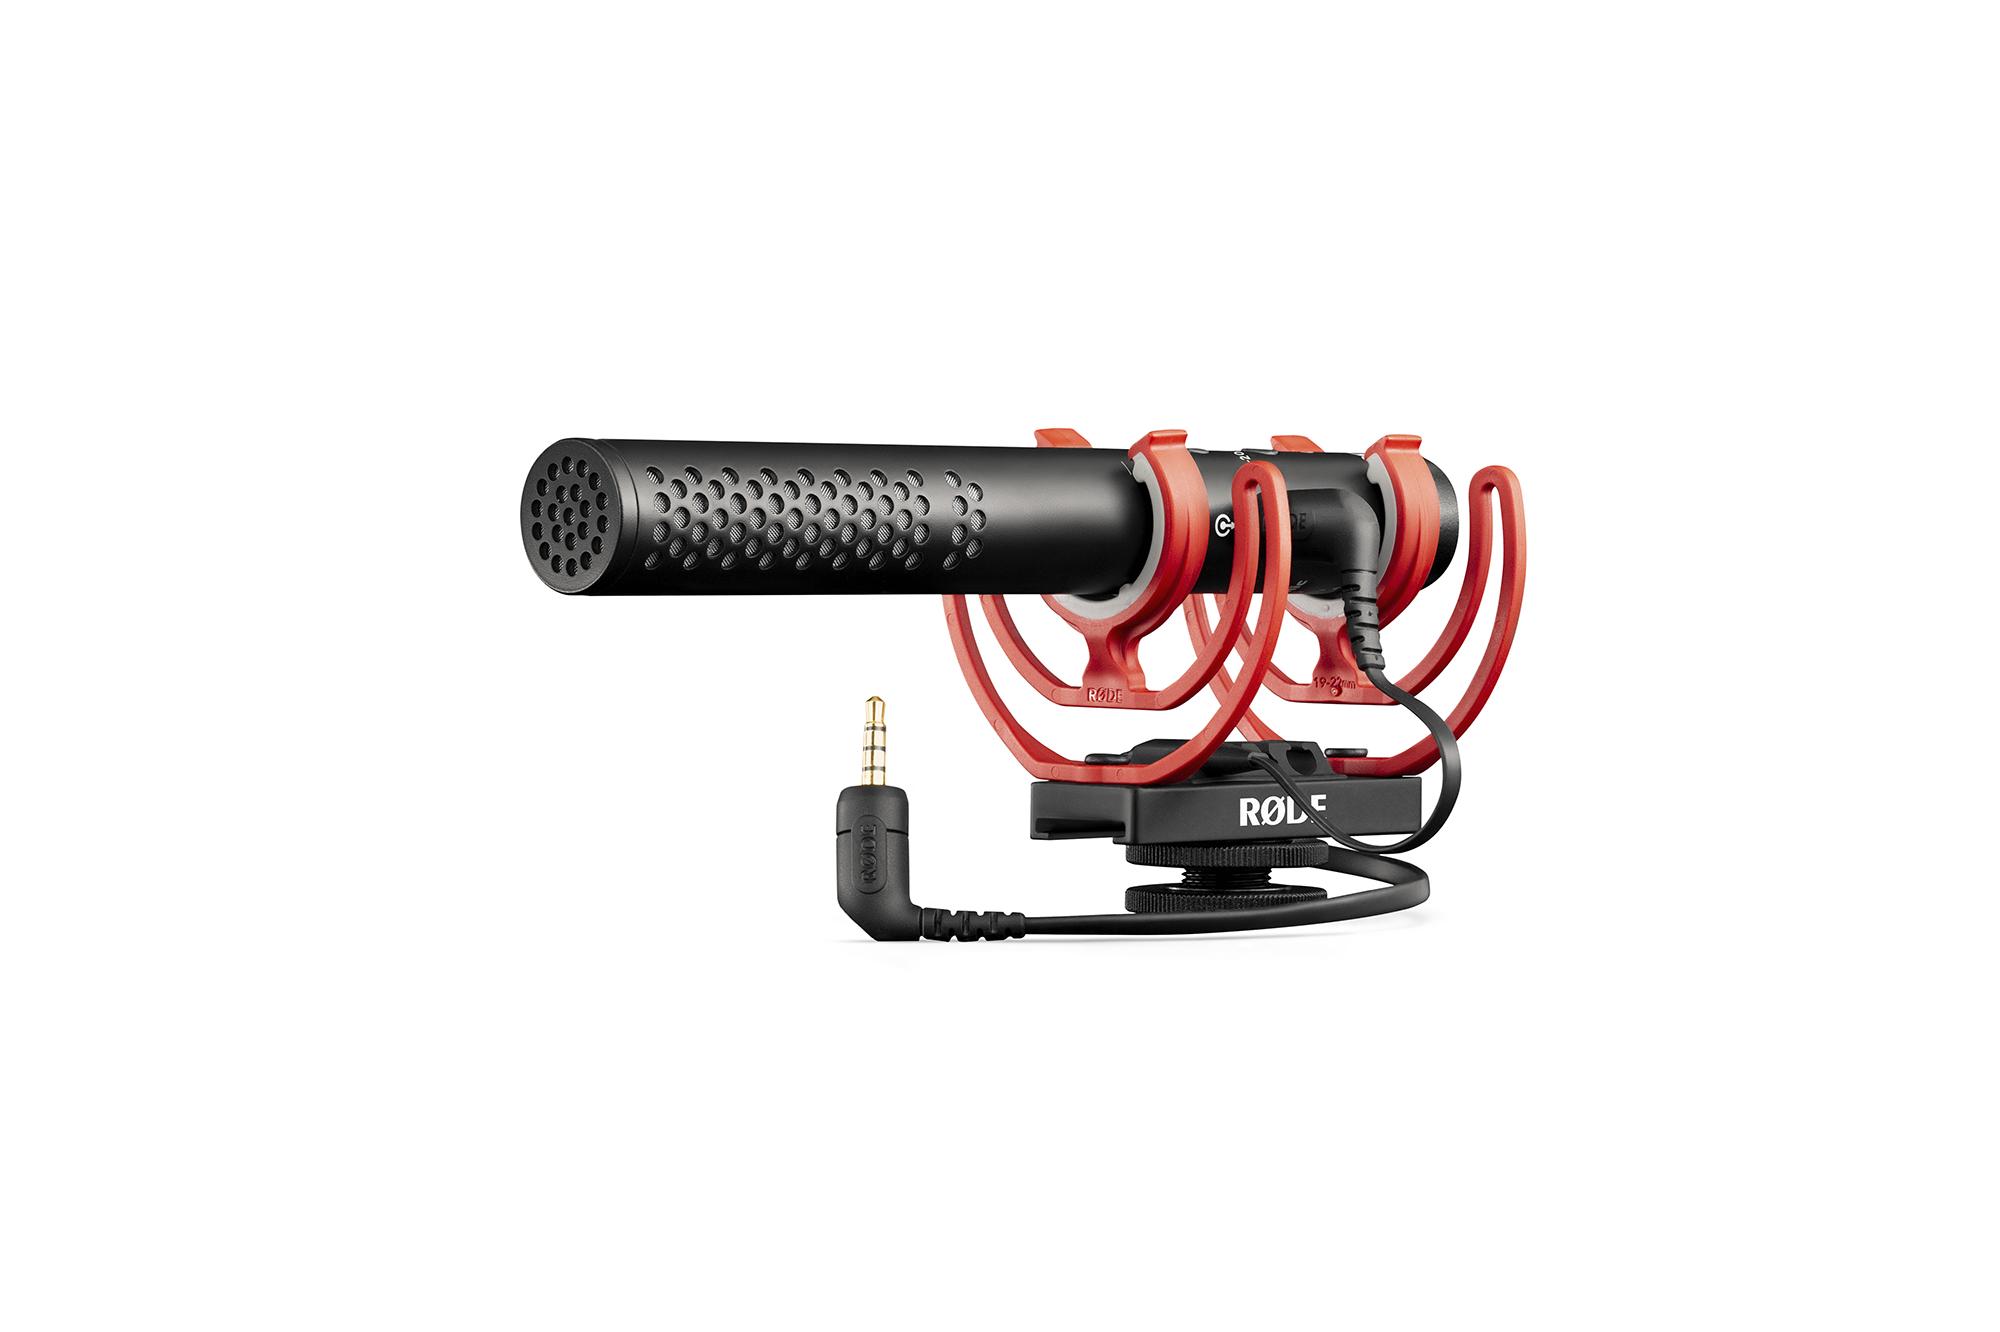 Kameramonterte mikrofoner | Scandinavianphoto.no